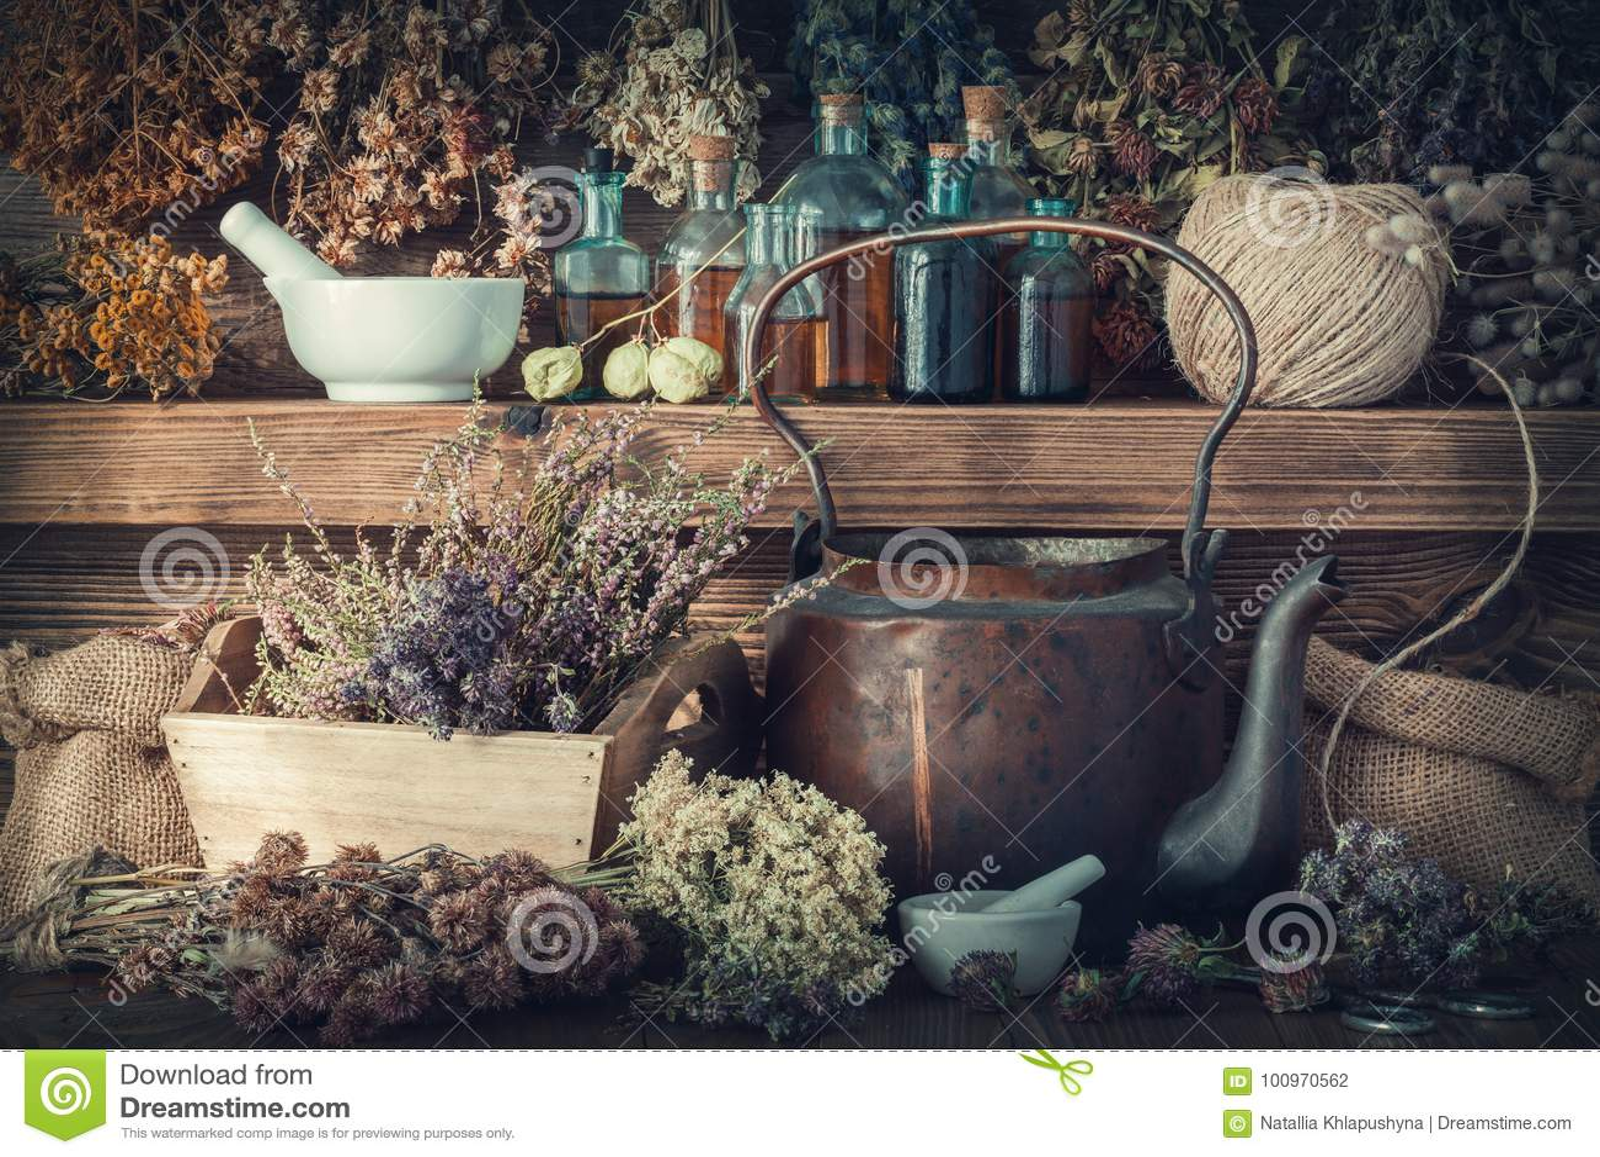 Tincture bottles, healthy herbs, mortar, curative drugs, old tea kettle on wooden shelf.